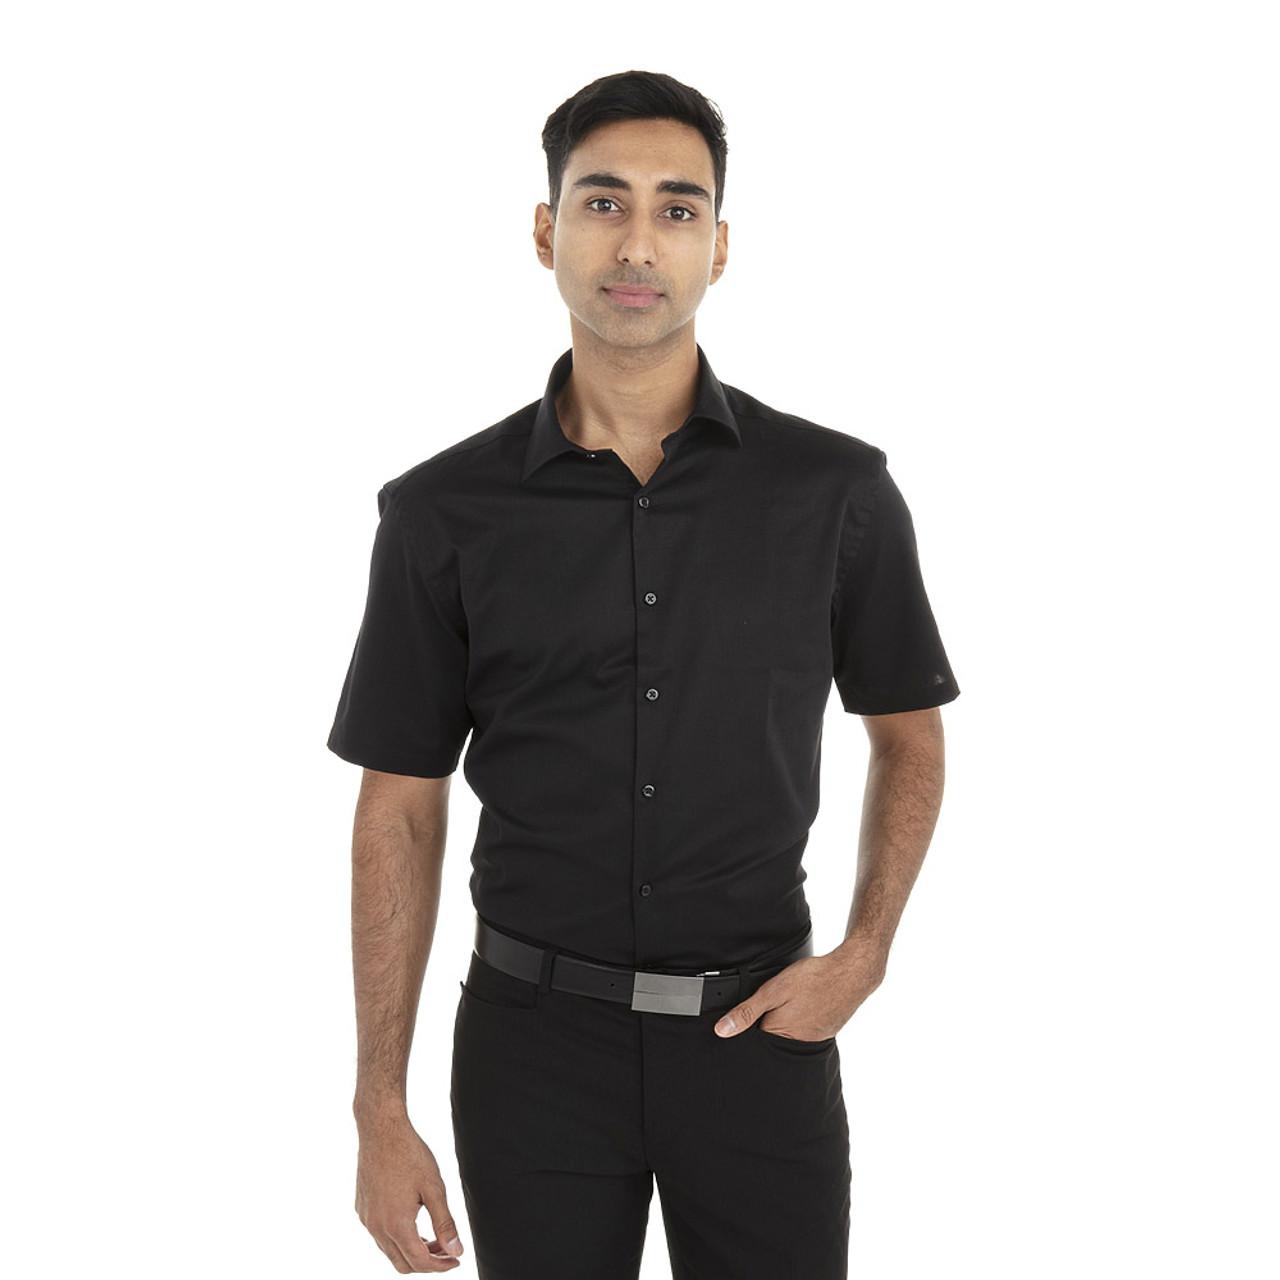 Black - 18CV317 Van Heusen Short Sleeve Dress Twill Shirt   T-shirt.ca